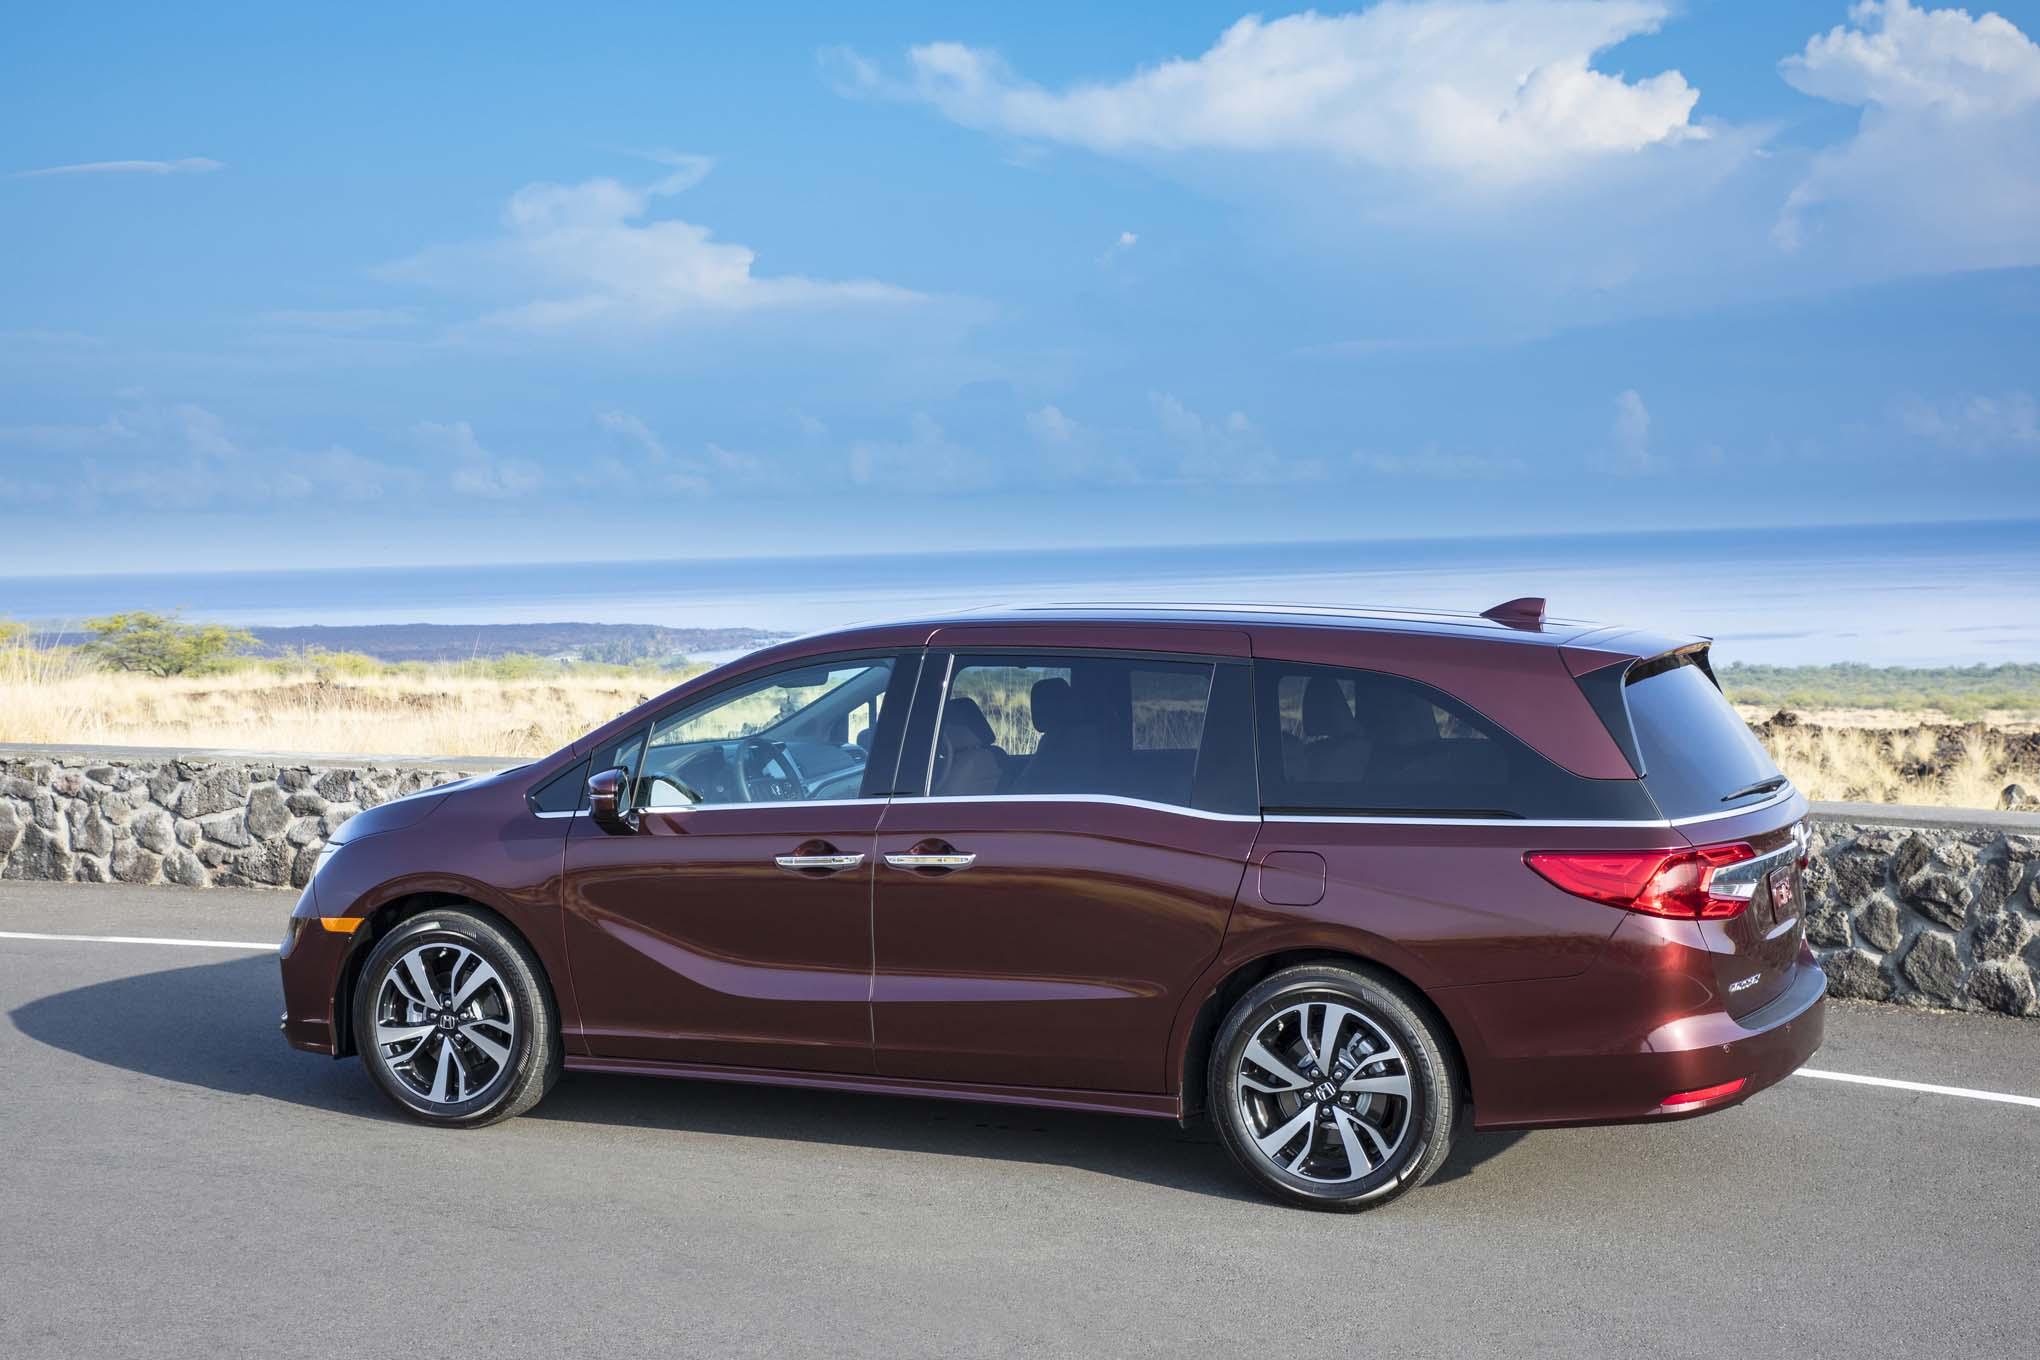 2018 Honda Odyssey Rear Three Quarter 06